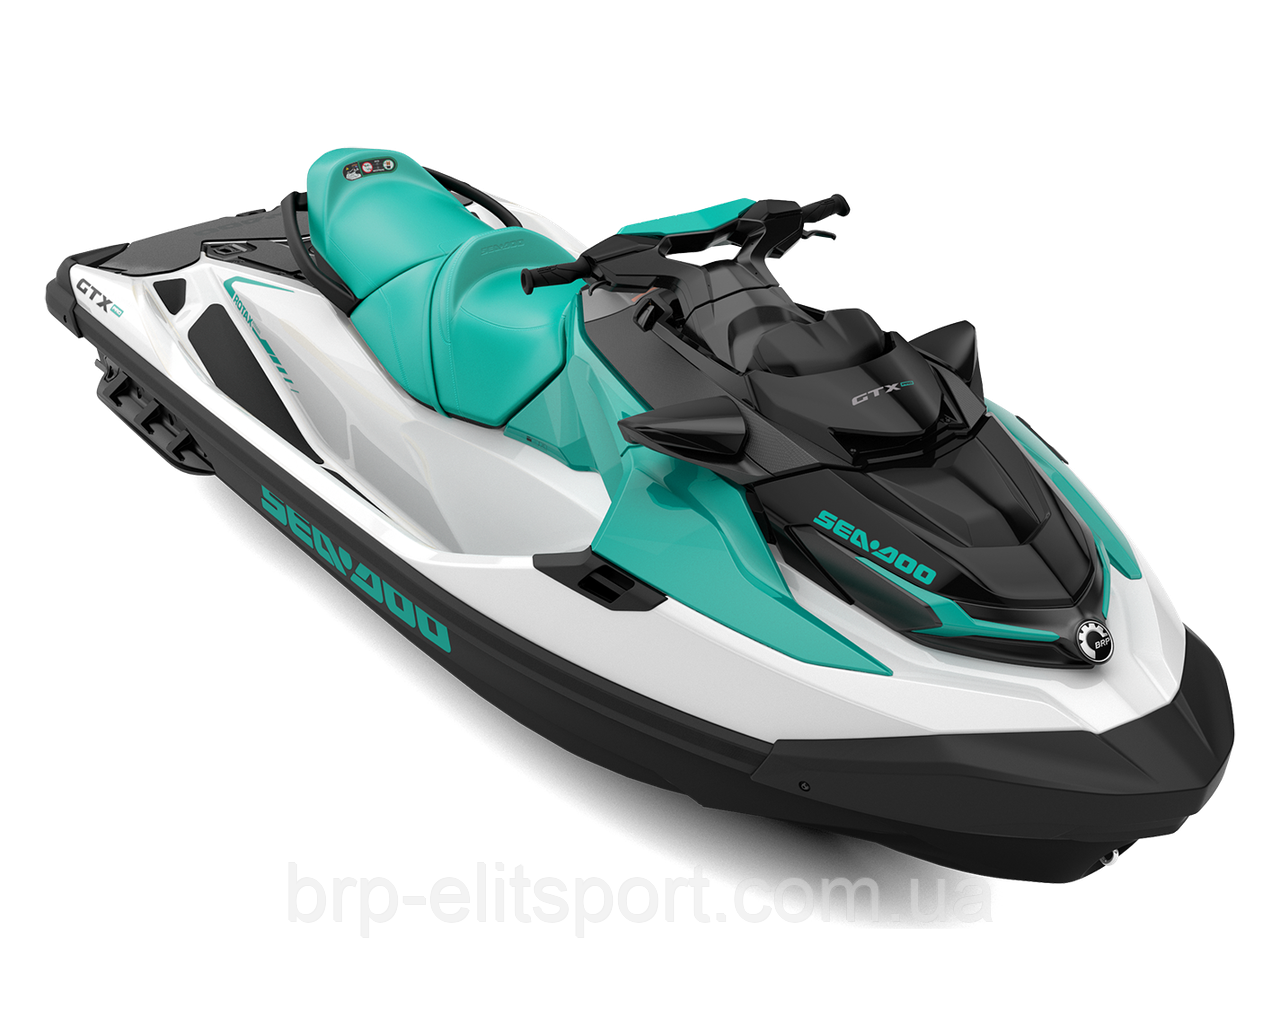 GTX 130 PRO Rental IBR (2021)